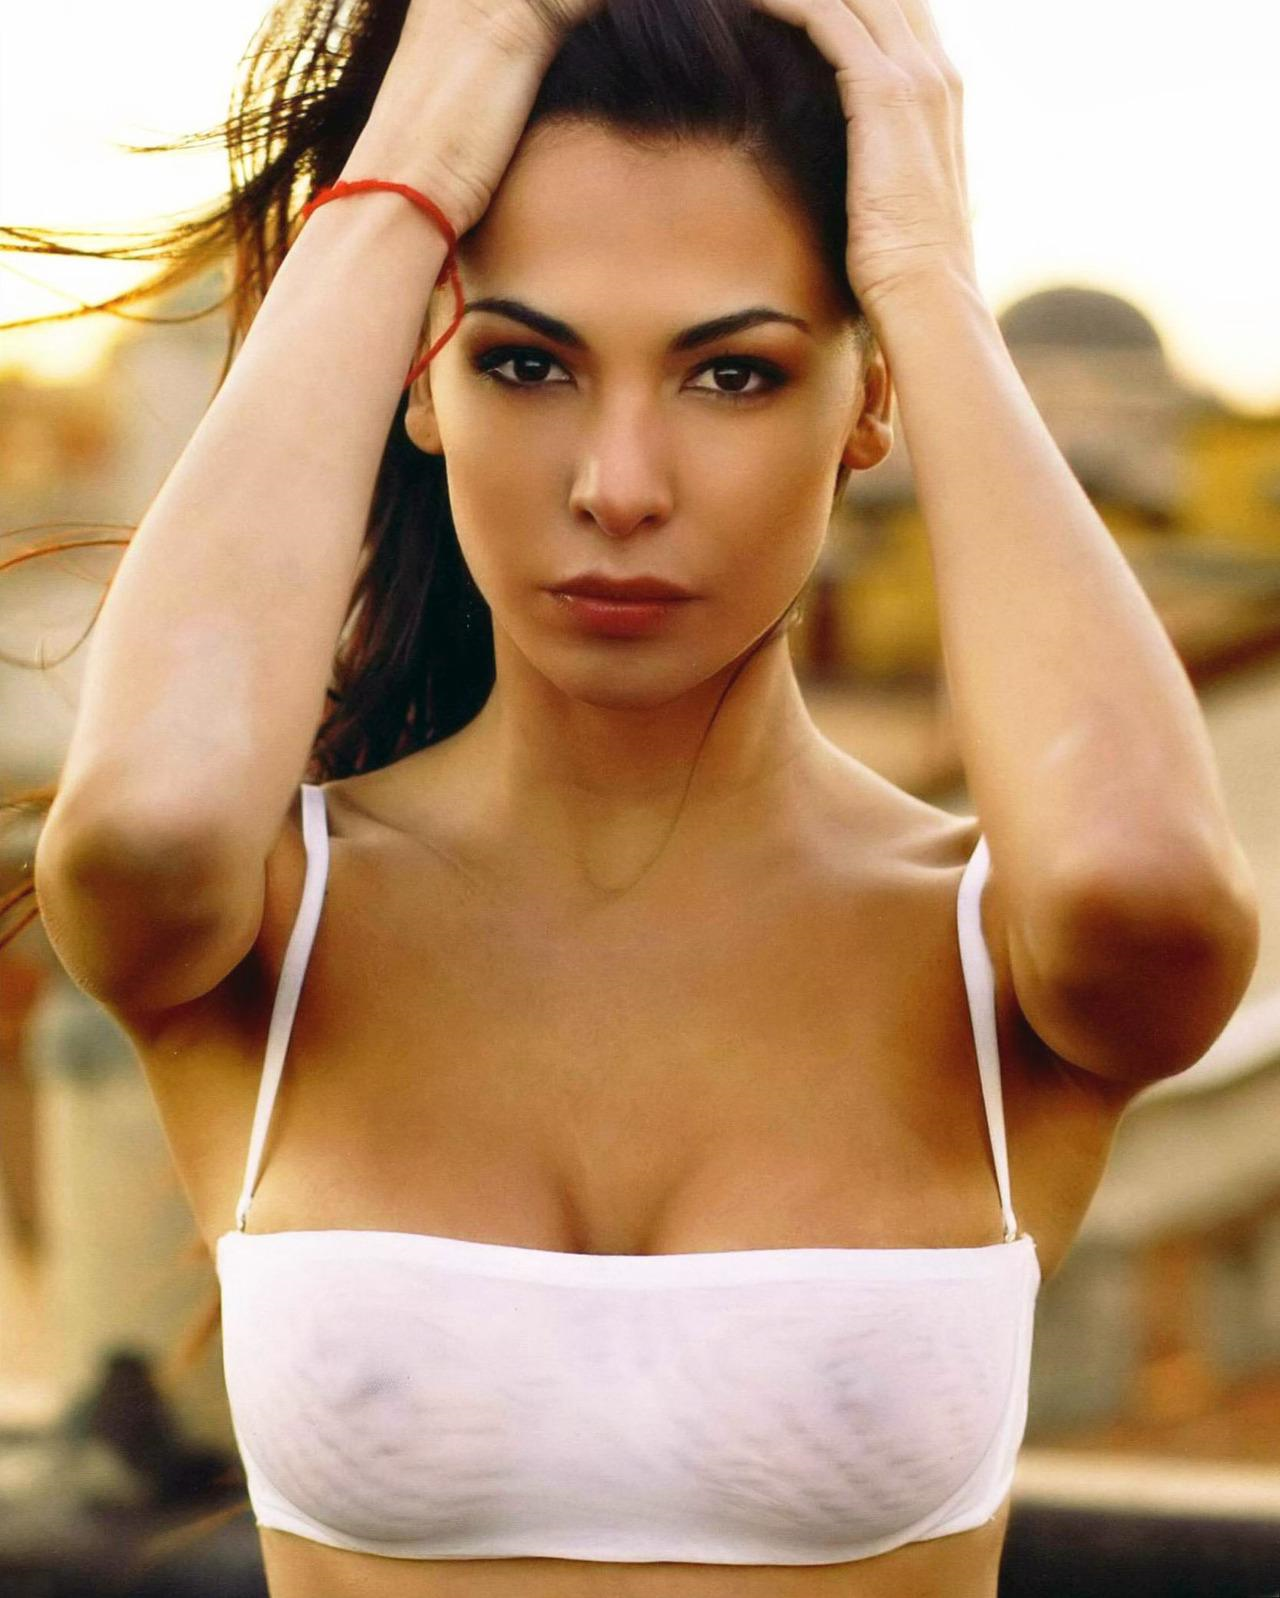 Moran Atias - breasts